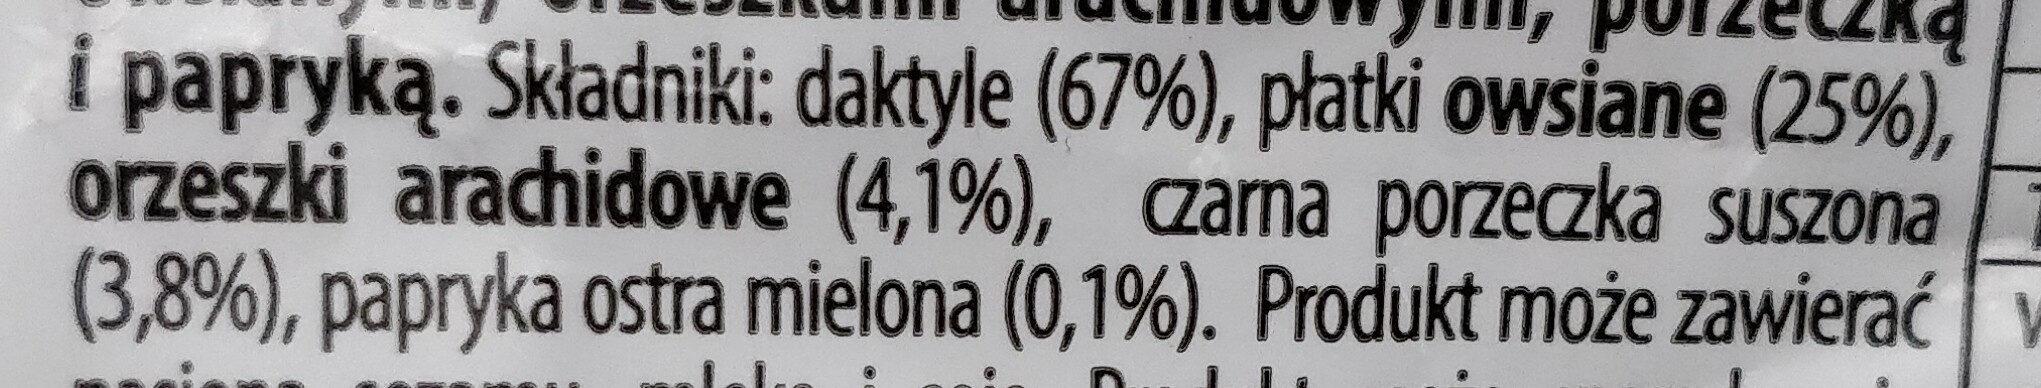 Musli Bar czarna porzeczka papryka - Ingrédients - pl